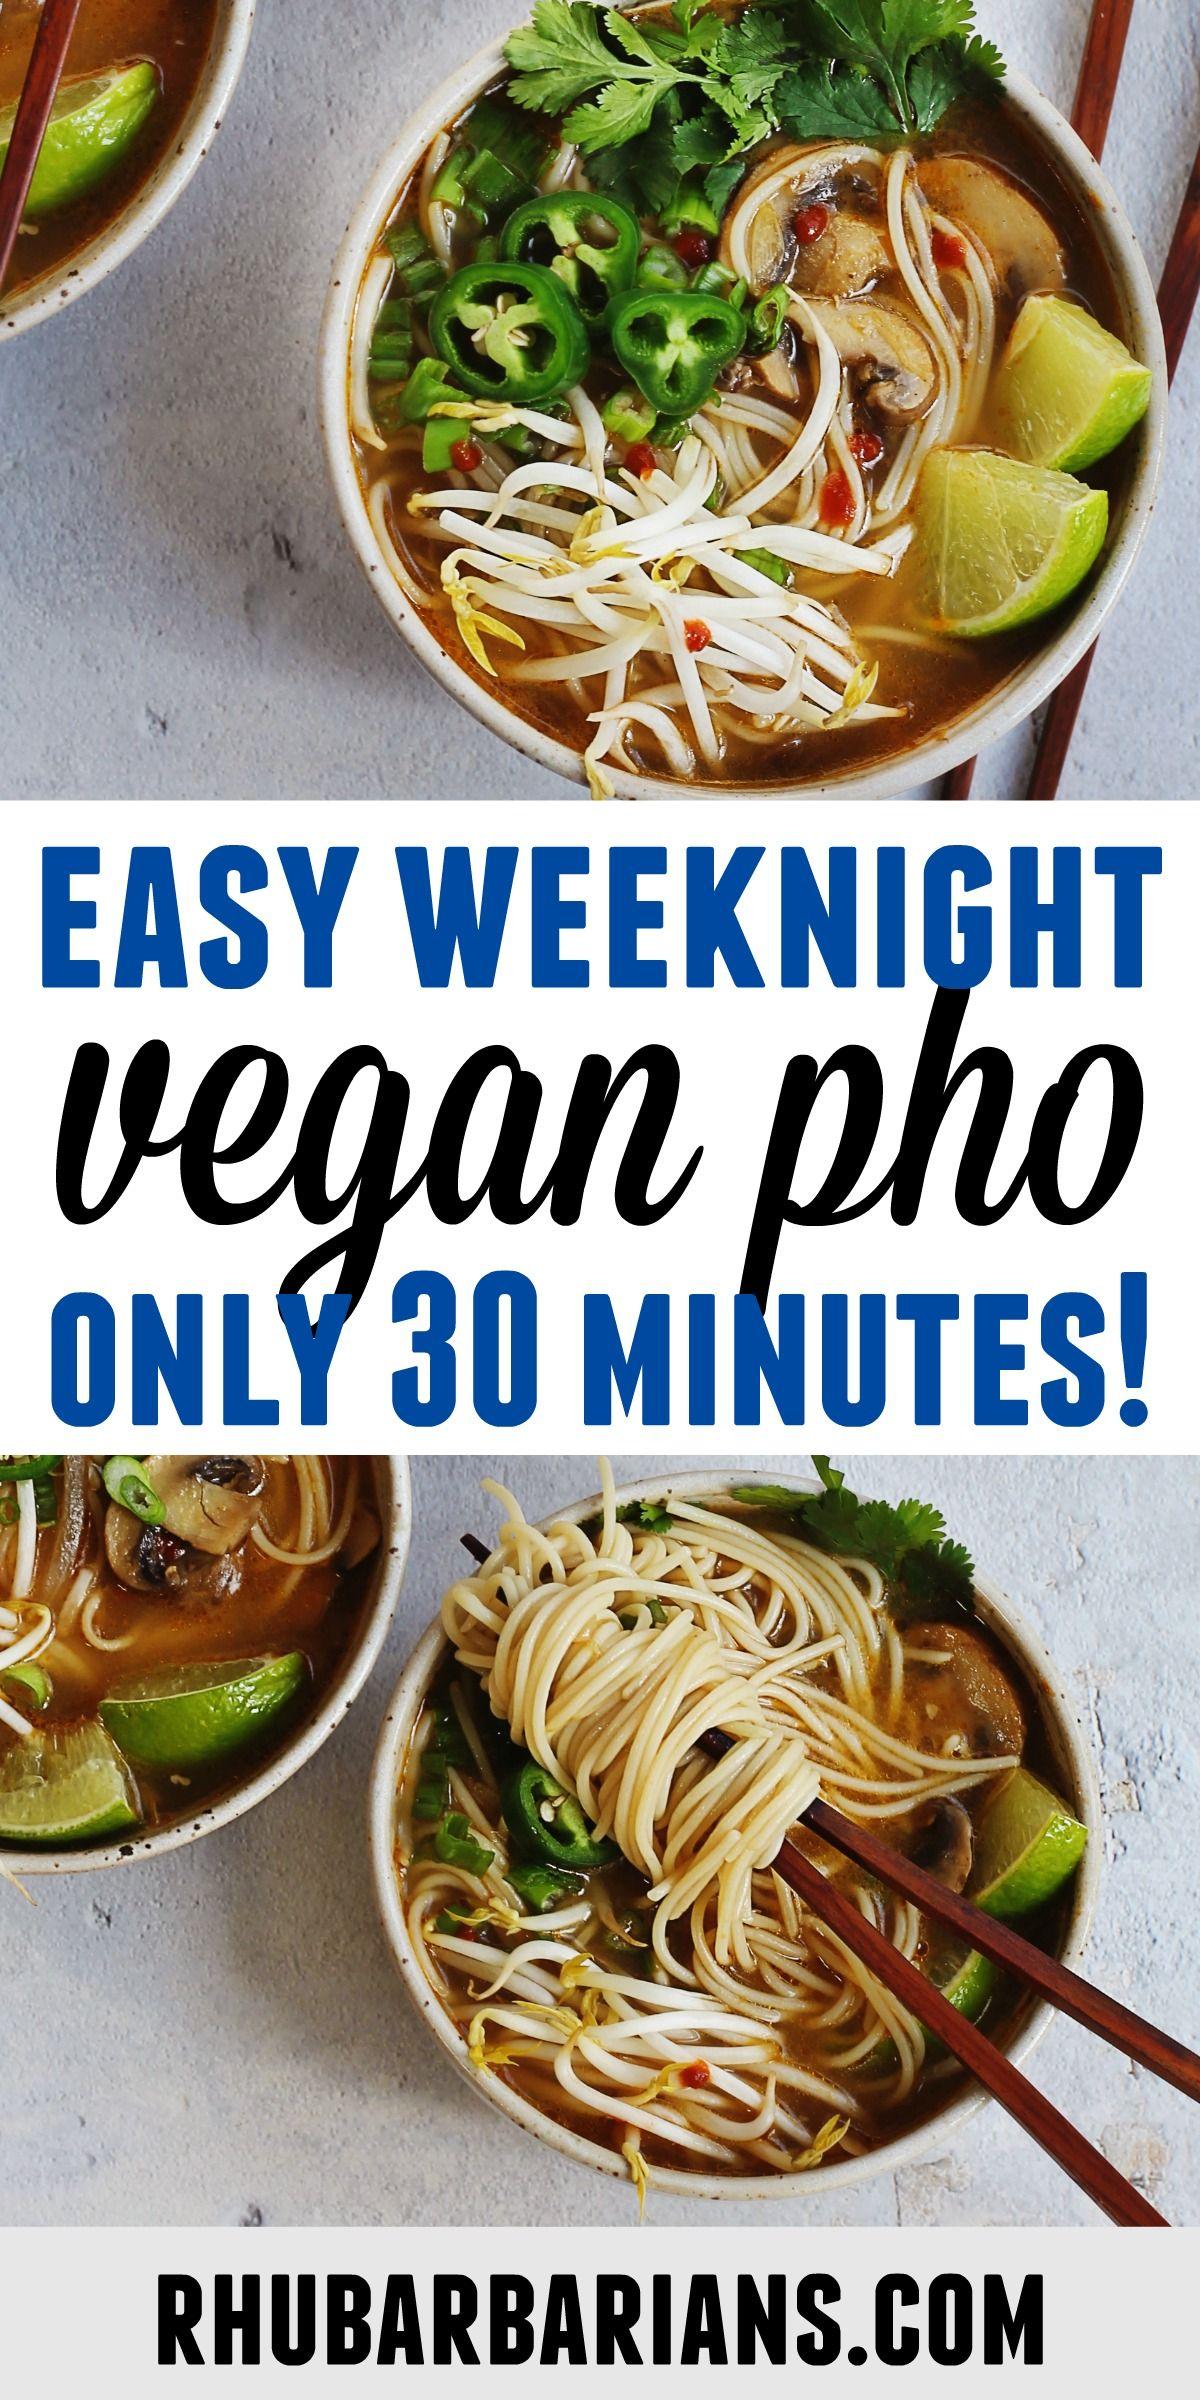 30 Minute Quick And Easy Vegan Pho Recipe Rhubarbarians Recipe In 2020 Vegan Pho Recipe Vegan Pho Whole Food Recipes